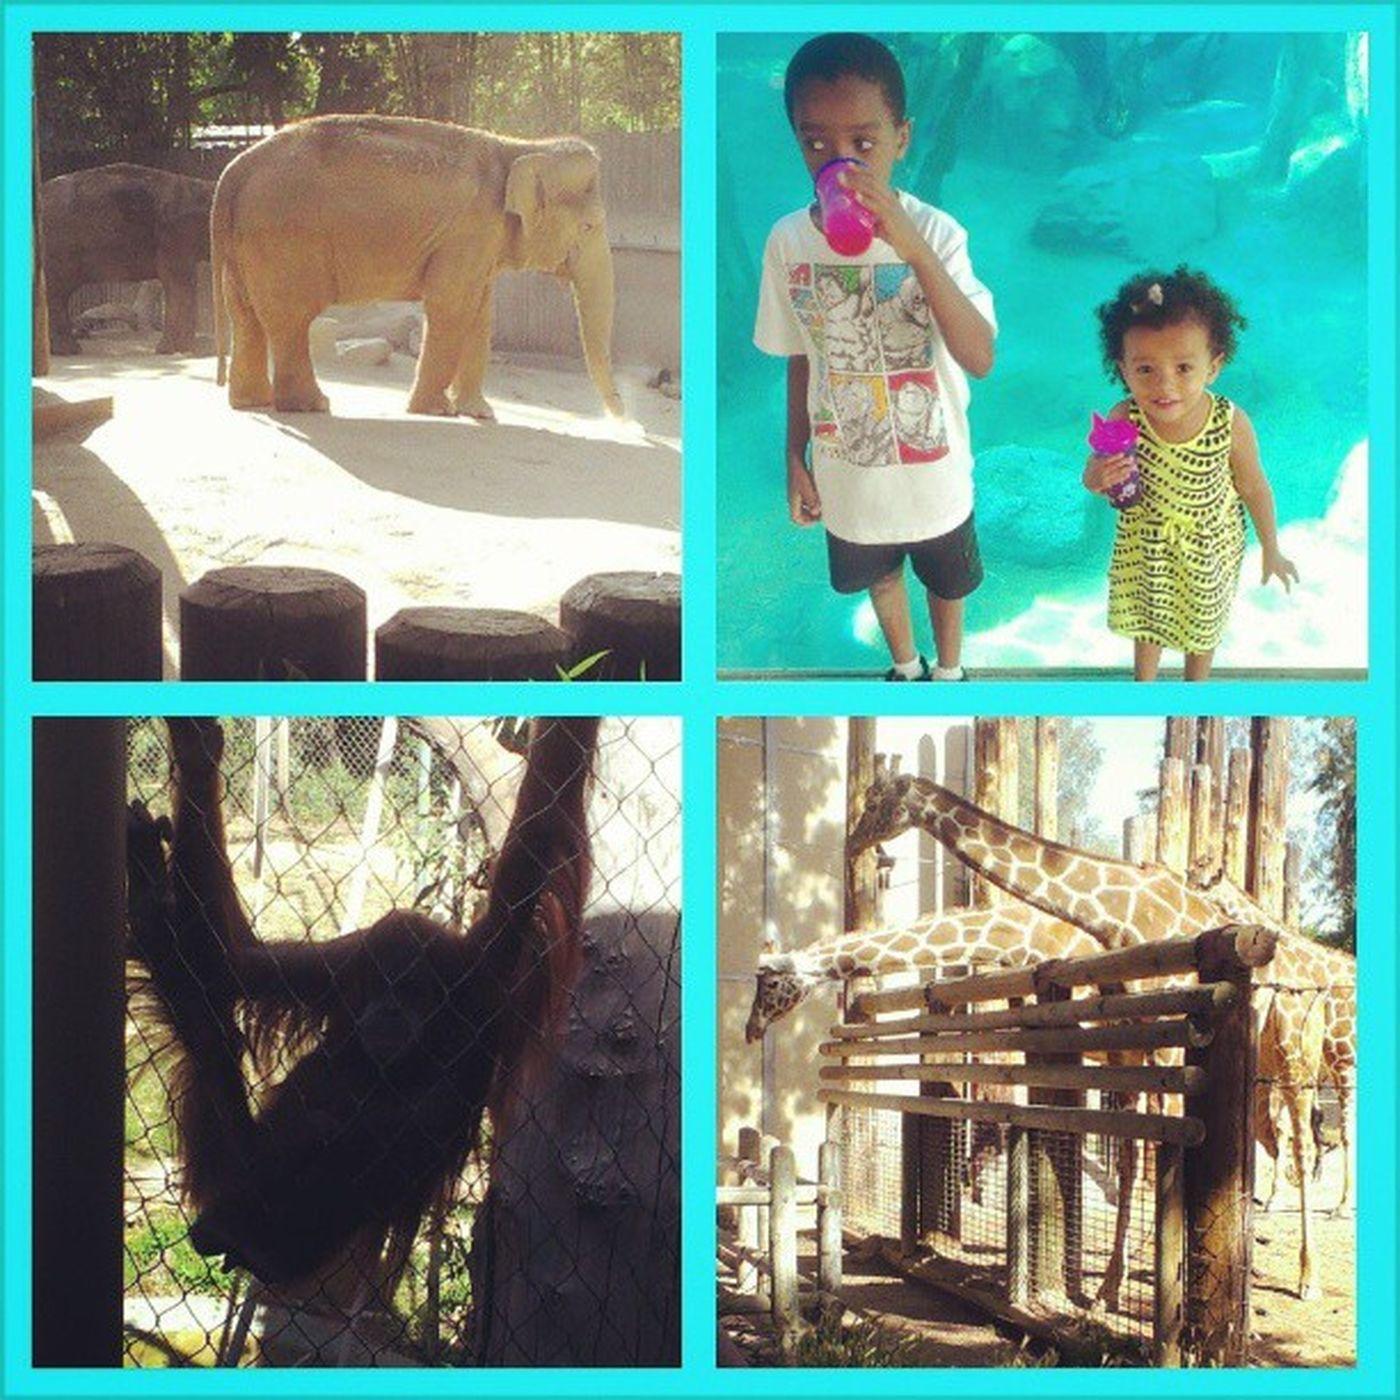 I had a great day at the #zoo with my family. #fresnochafeezoo Kids Love Fresnochafeezoo